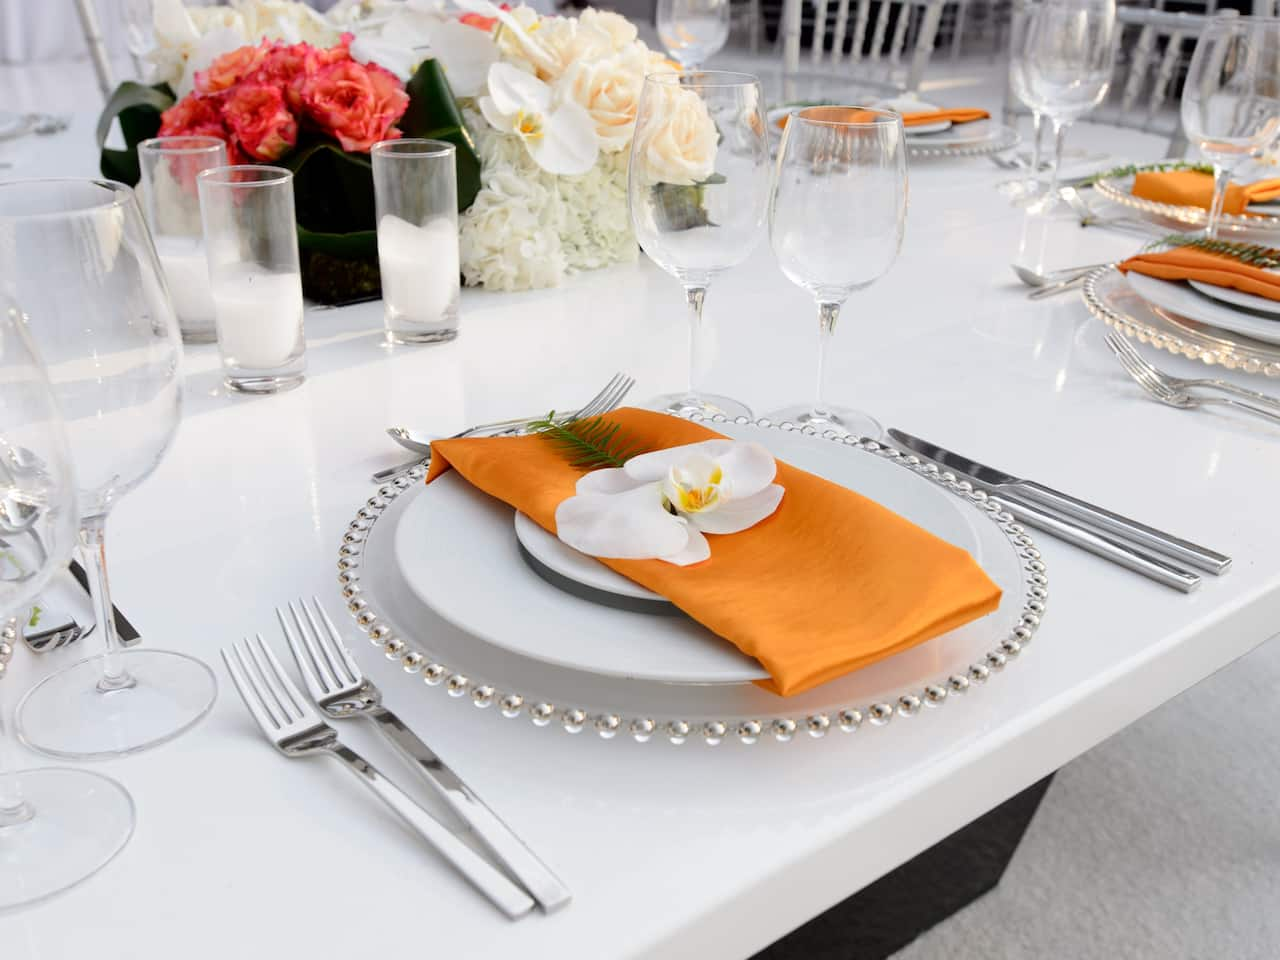 Decorated table for wedding reception at Hyatt Regency Los Angeles International Airport